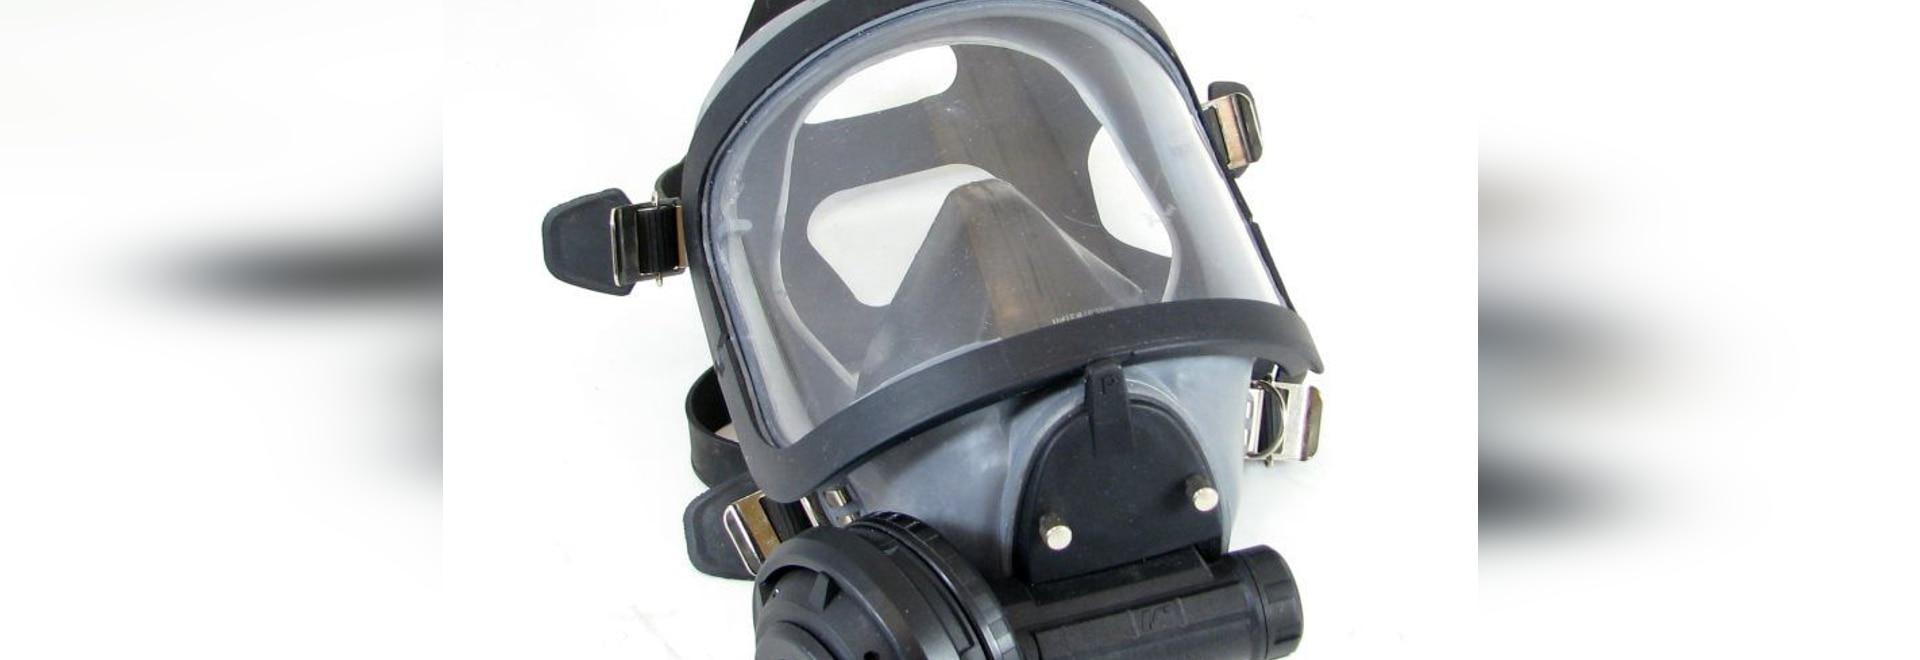 NOUVEAUTÉ : masque respiratoire by Interspiro